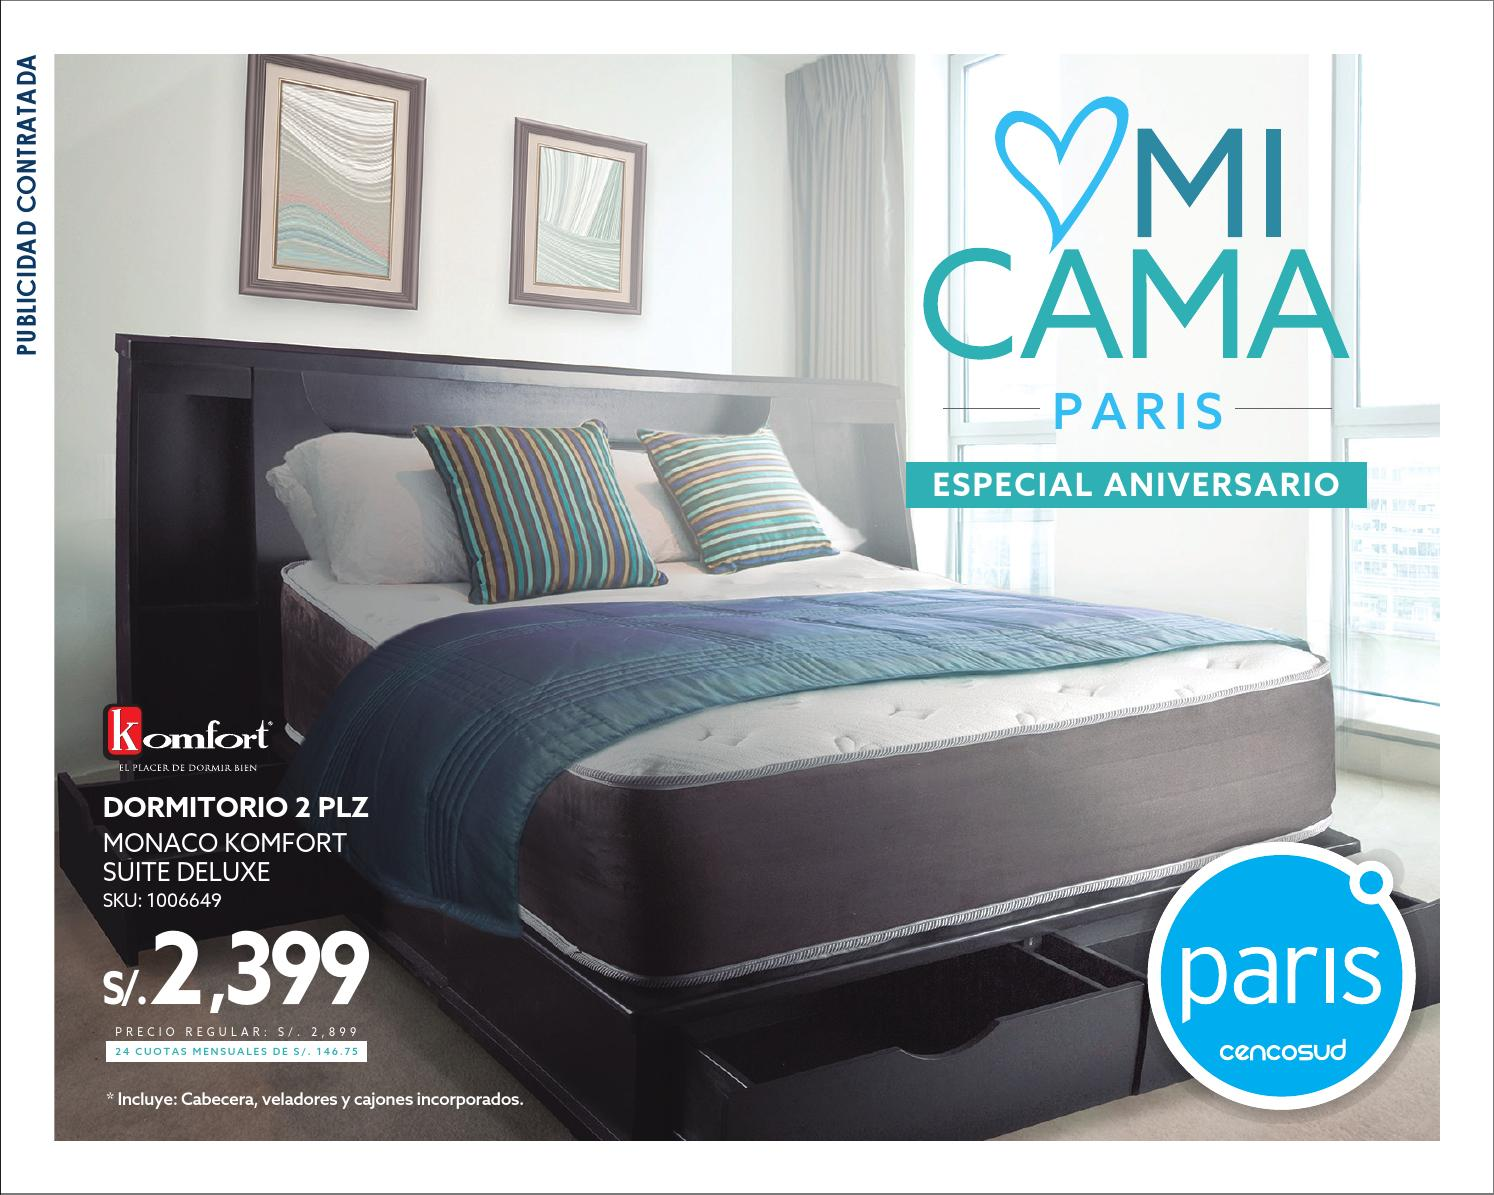 Paris cat logo colchones by paris issuu - Precios de colchones hinchables ...